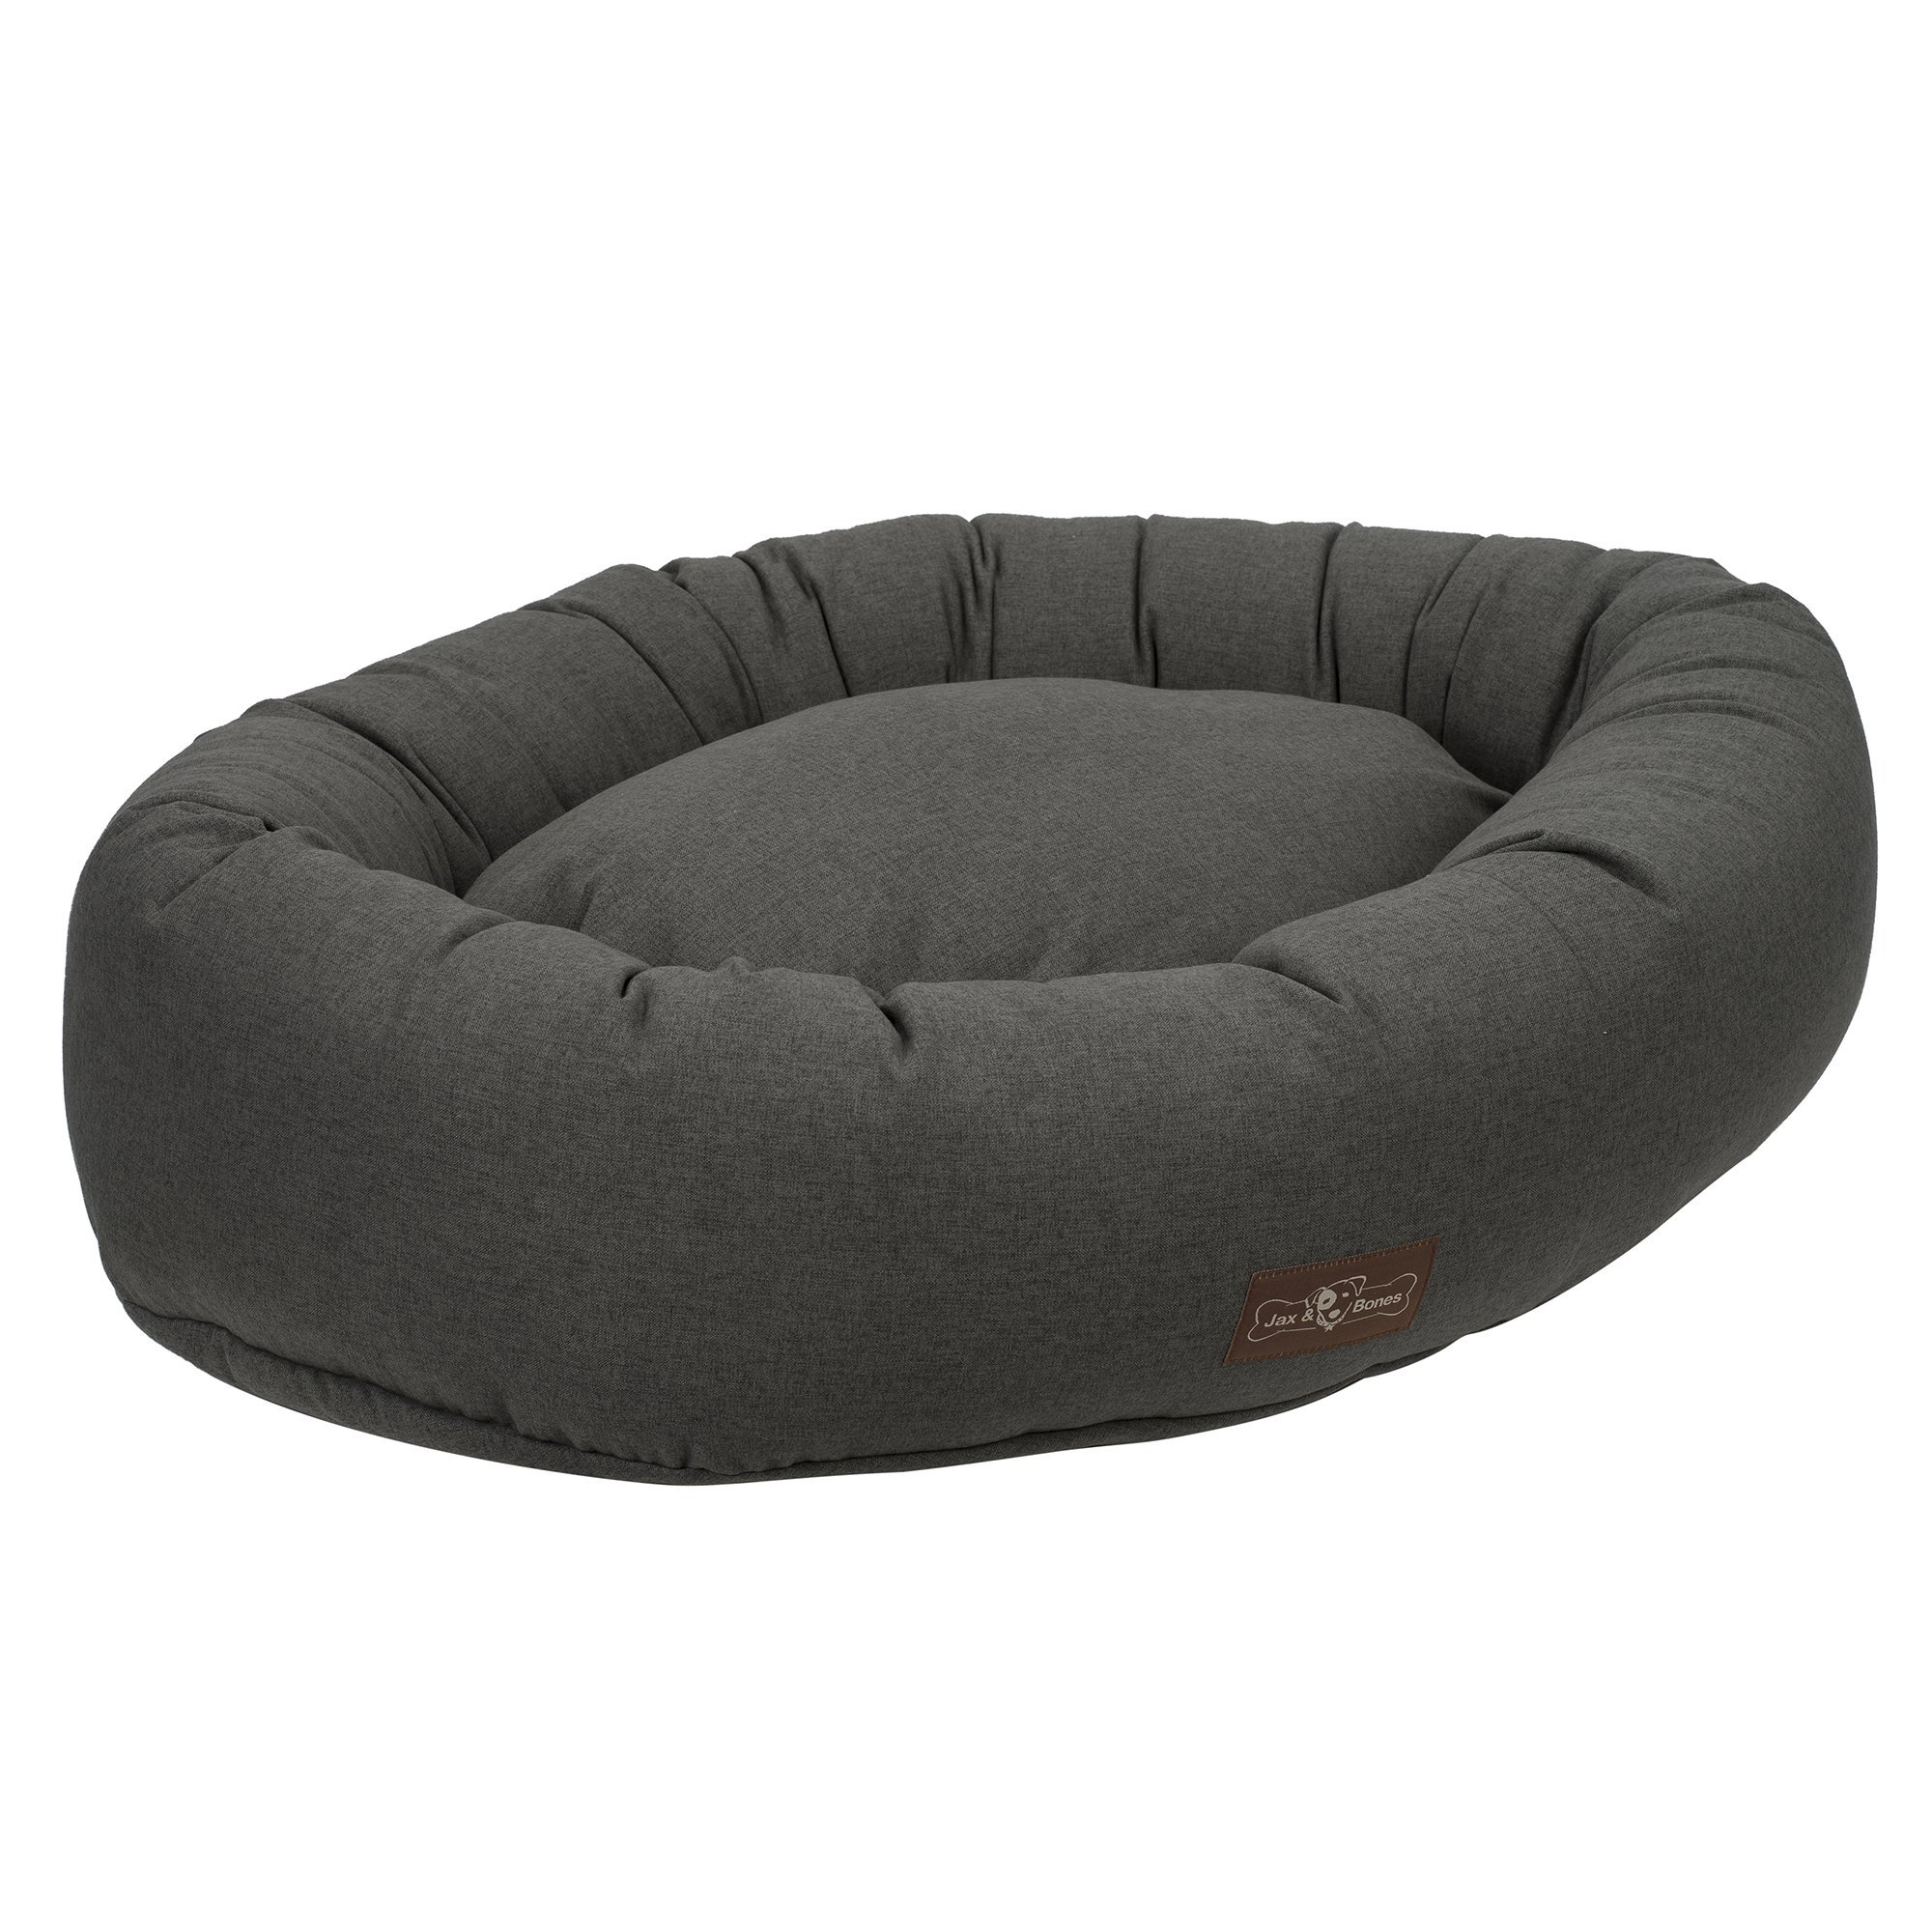 Jax and Bones Licorice Standard Wool Blend Donut Dog Bed, Large